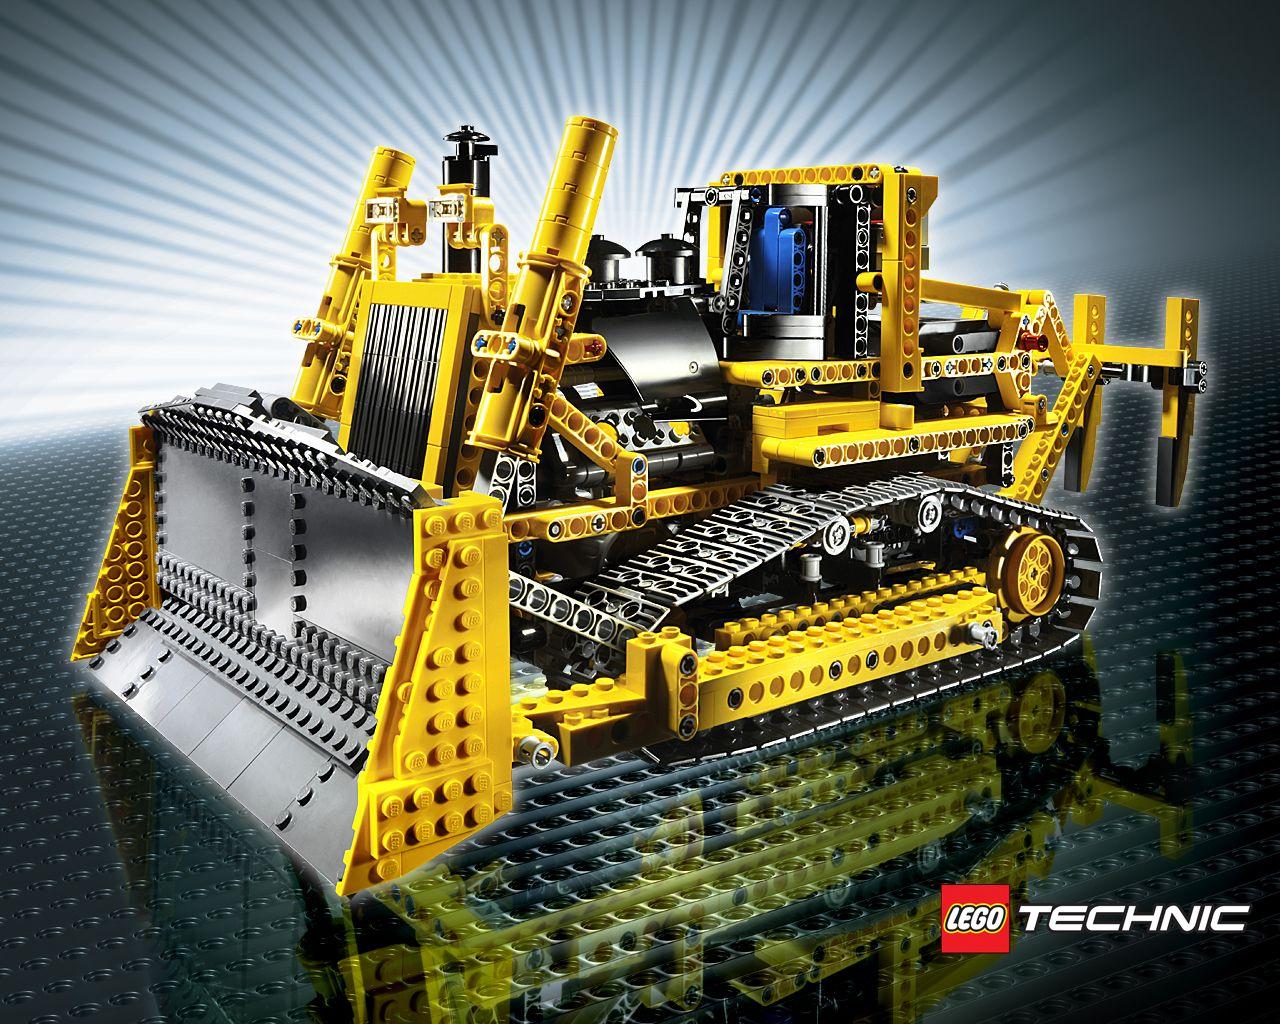 Tech Toys for Kids Lego Technic Gadgets Pinterest